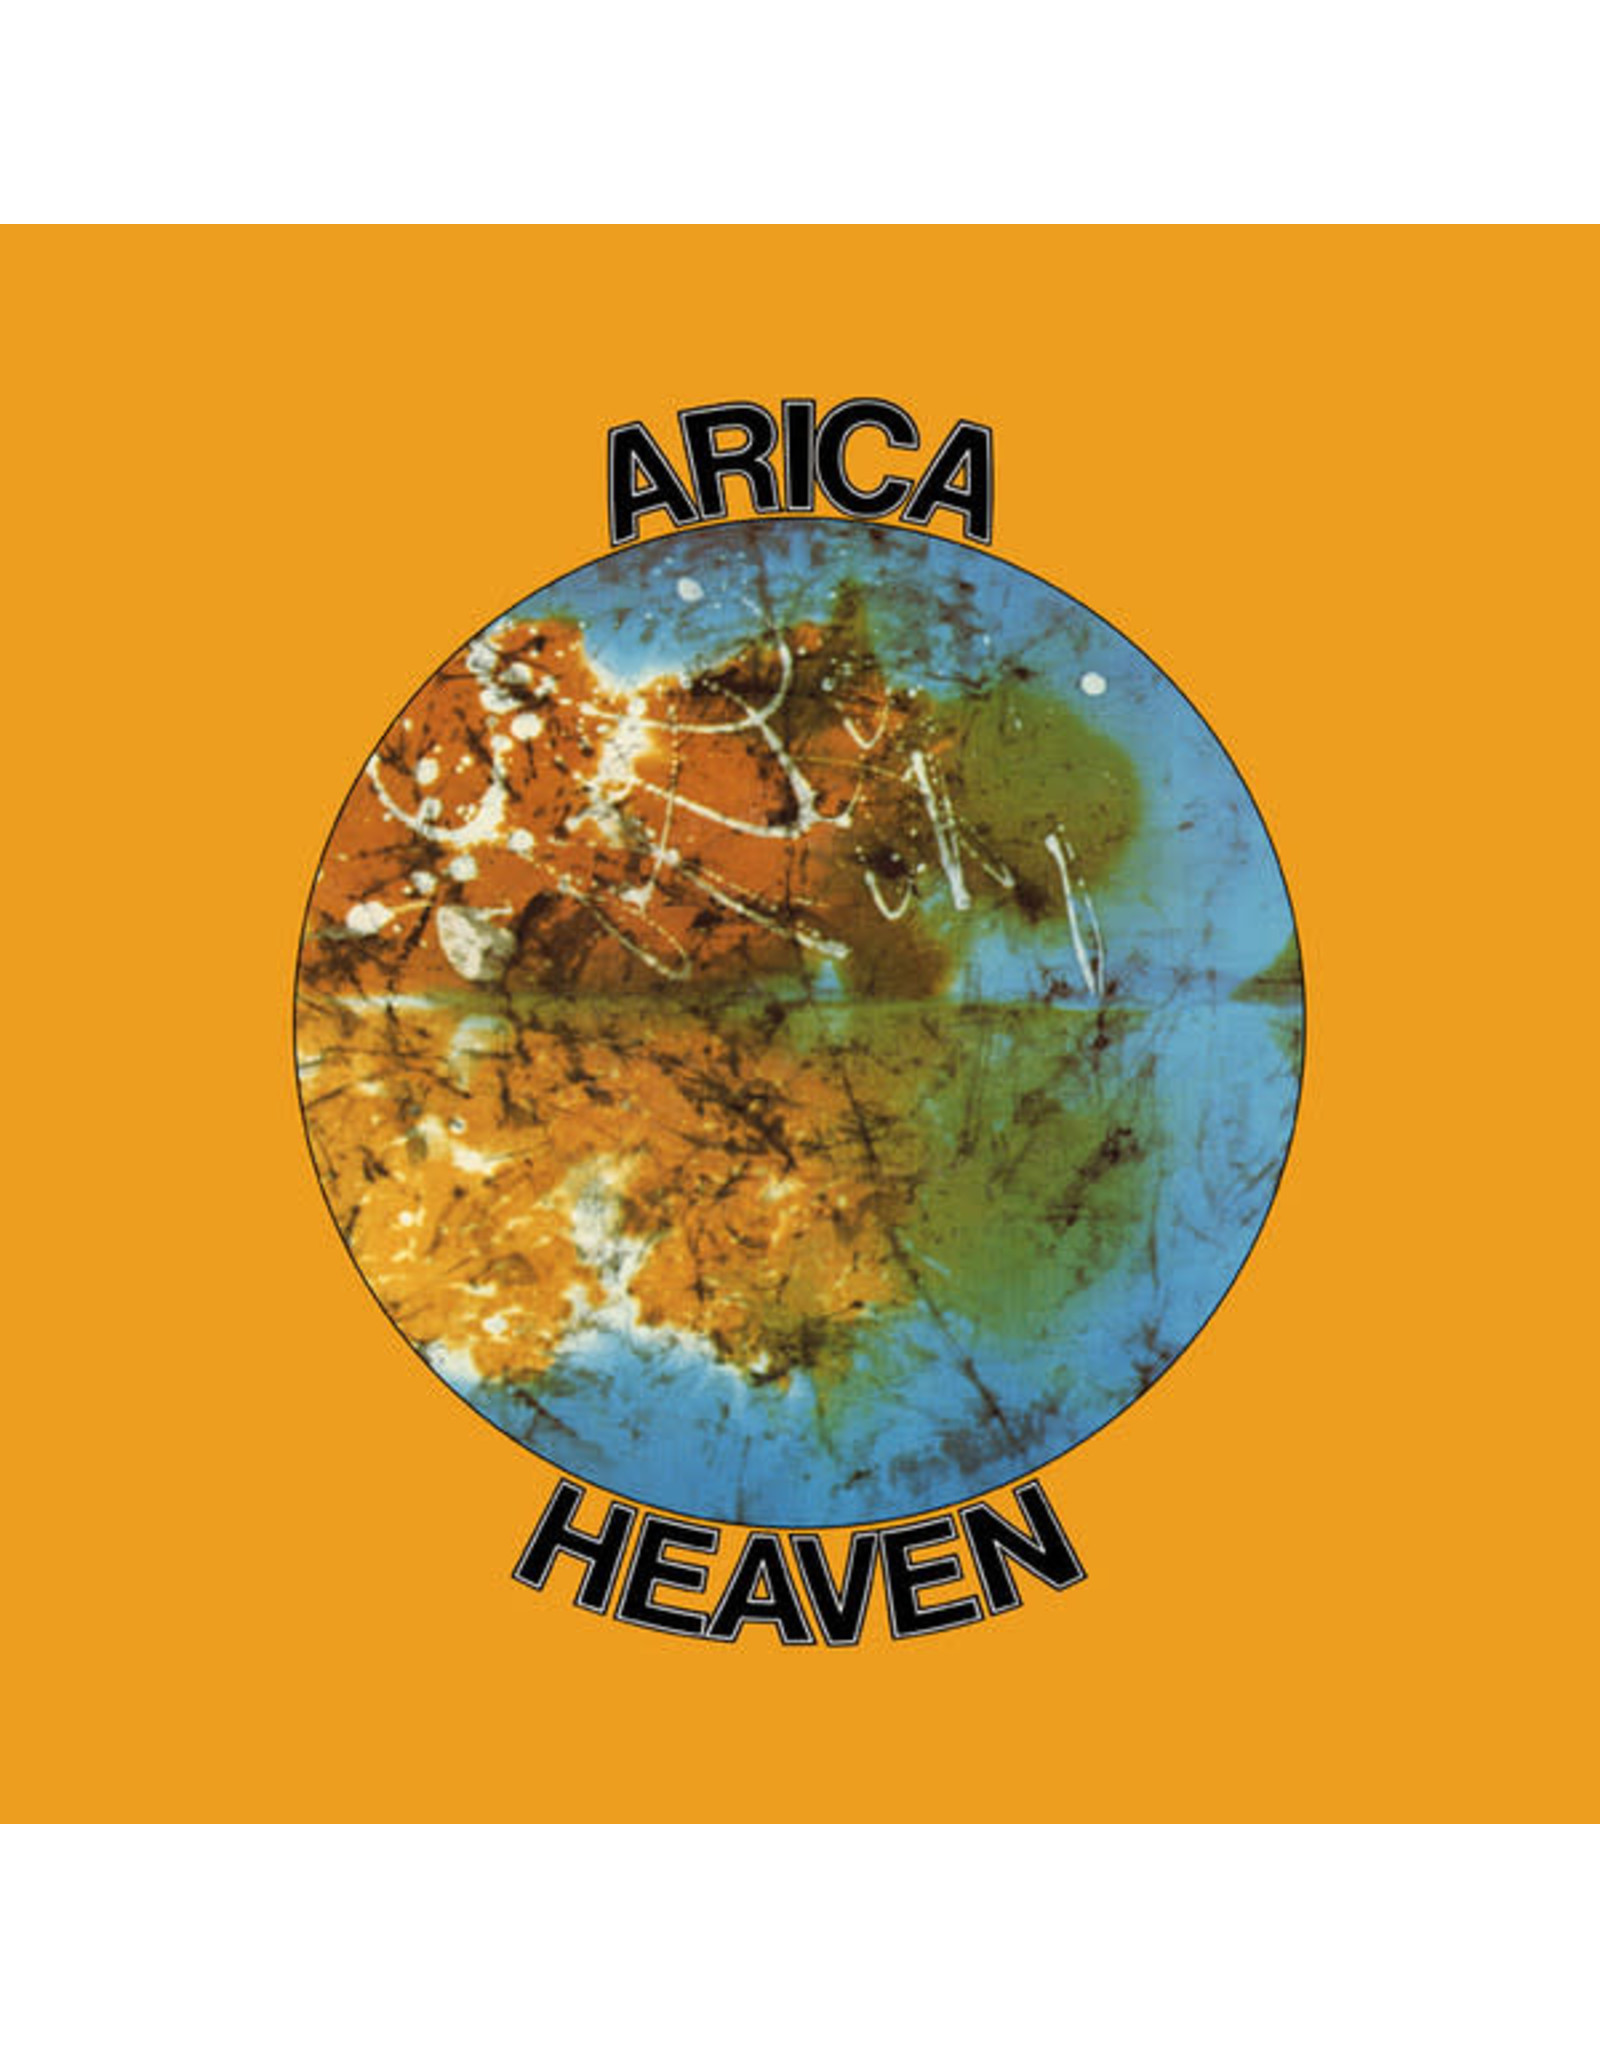 New Vinyl Arica - Heaven LP